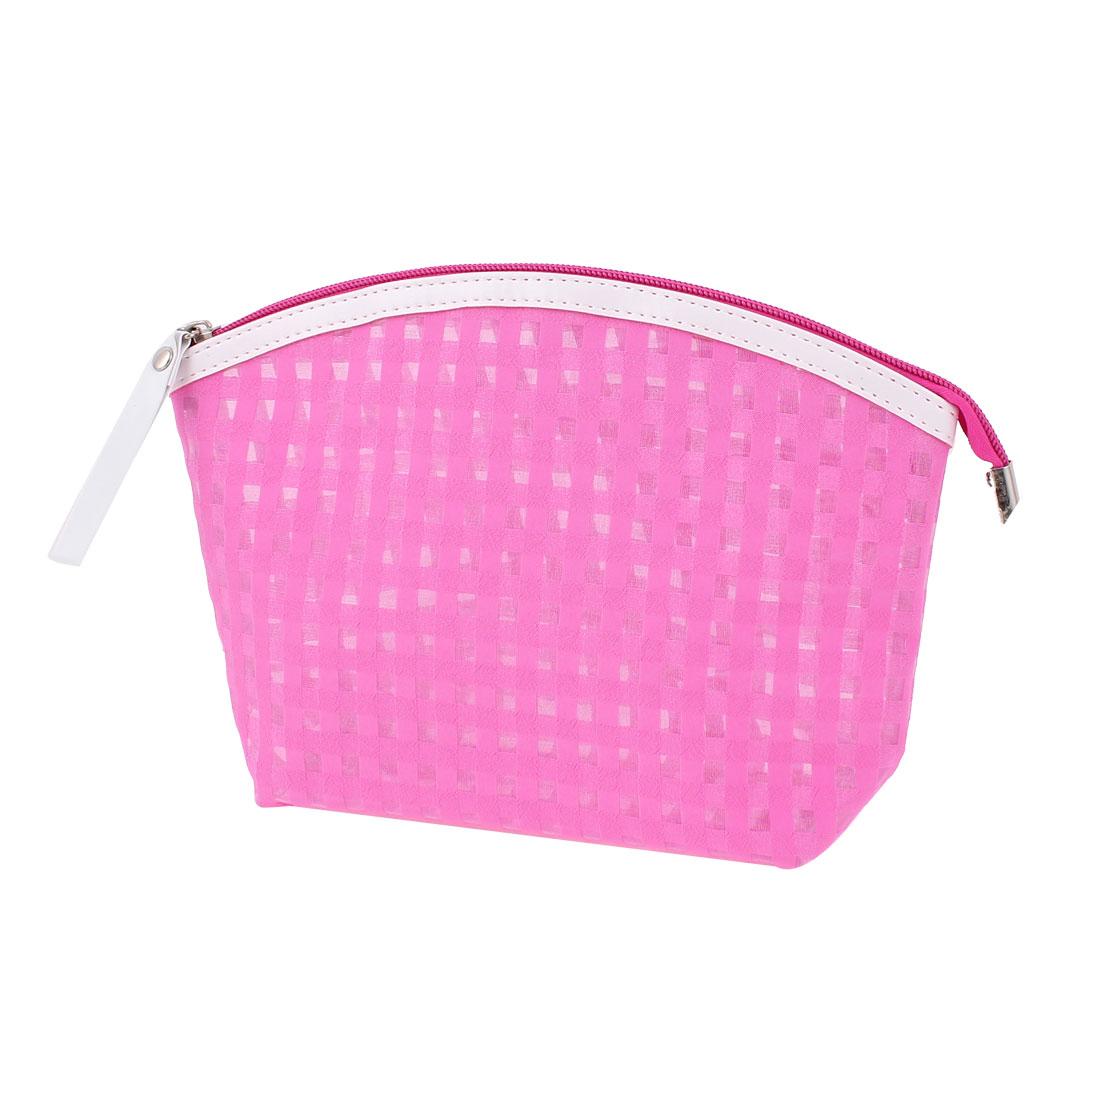 Woman Travel Portable Zipper Closure Plaids Pattern PVC Cosmetic Makeup Bag Toiletries Sundries Holder Fuchsia